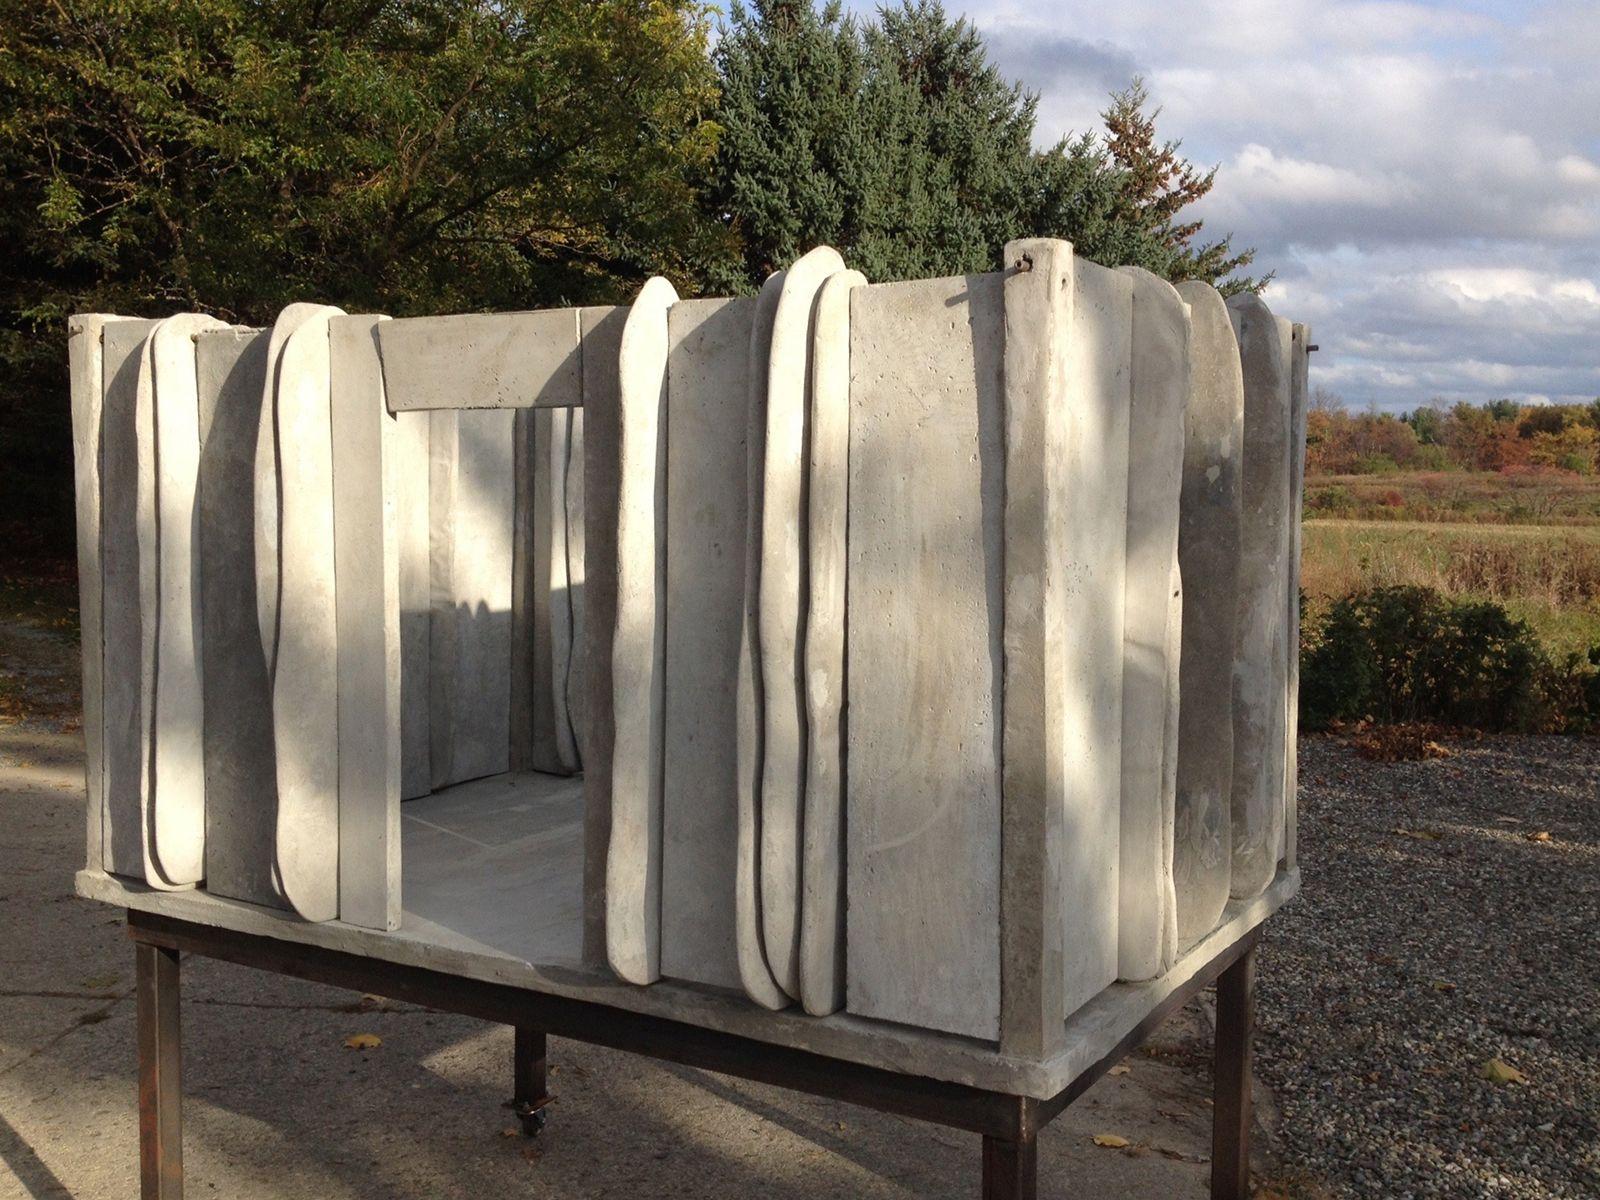 Mia Westerlund RoosenArchitectural Folly 8, 2015Concrete and Steel60 x 60 x 30 inches